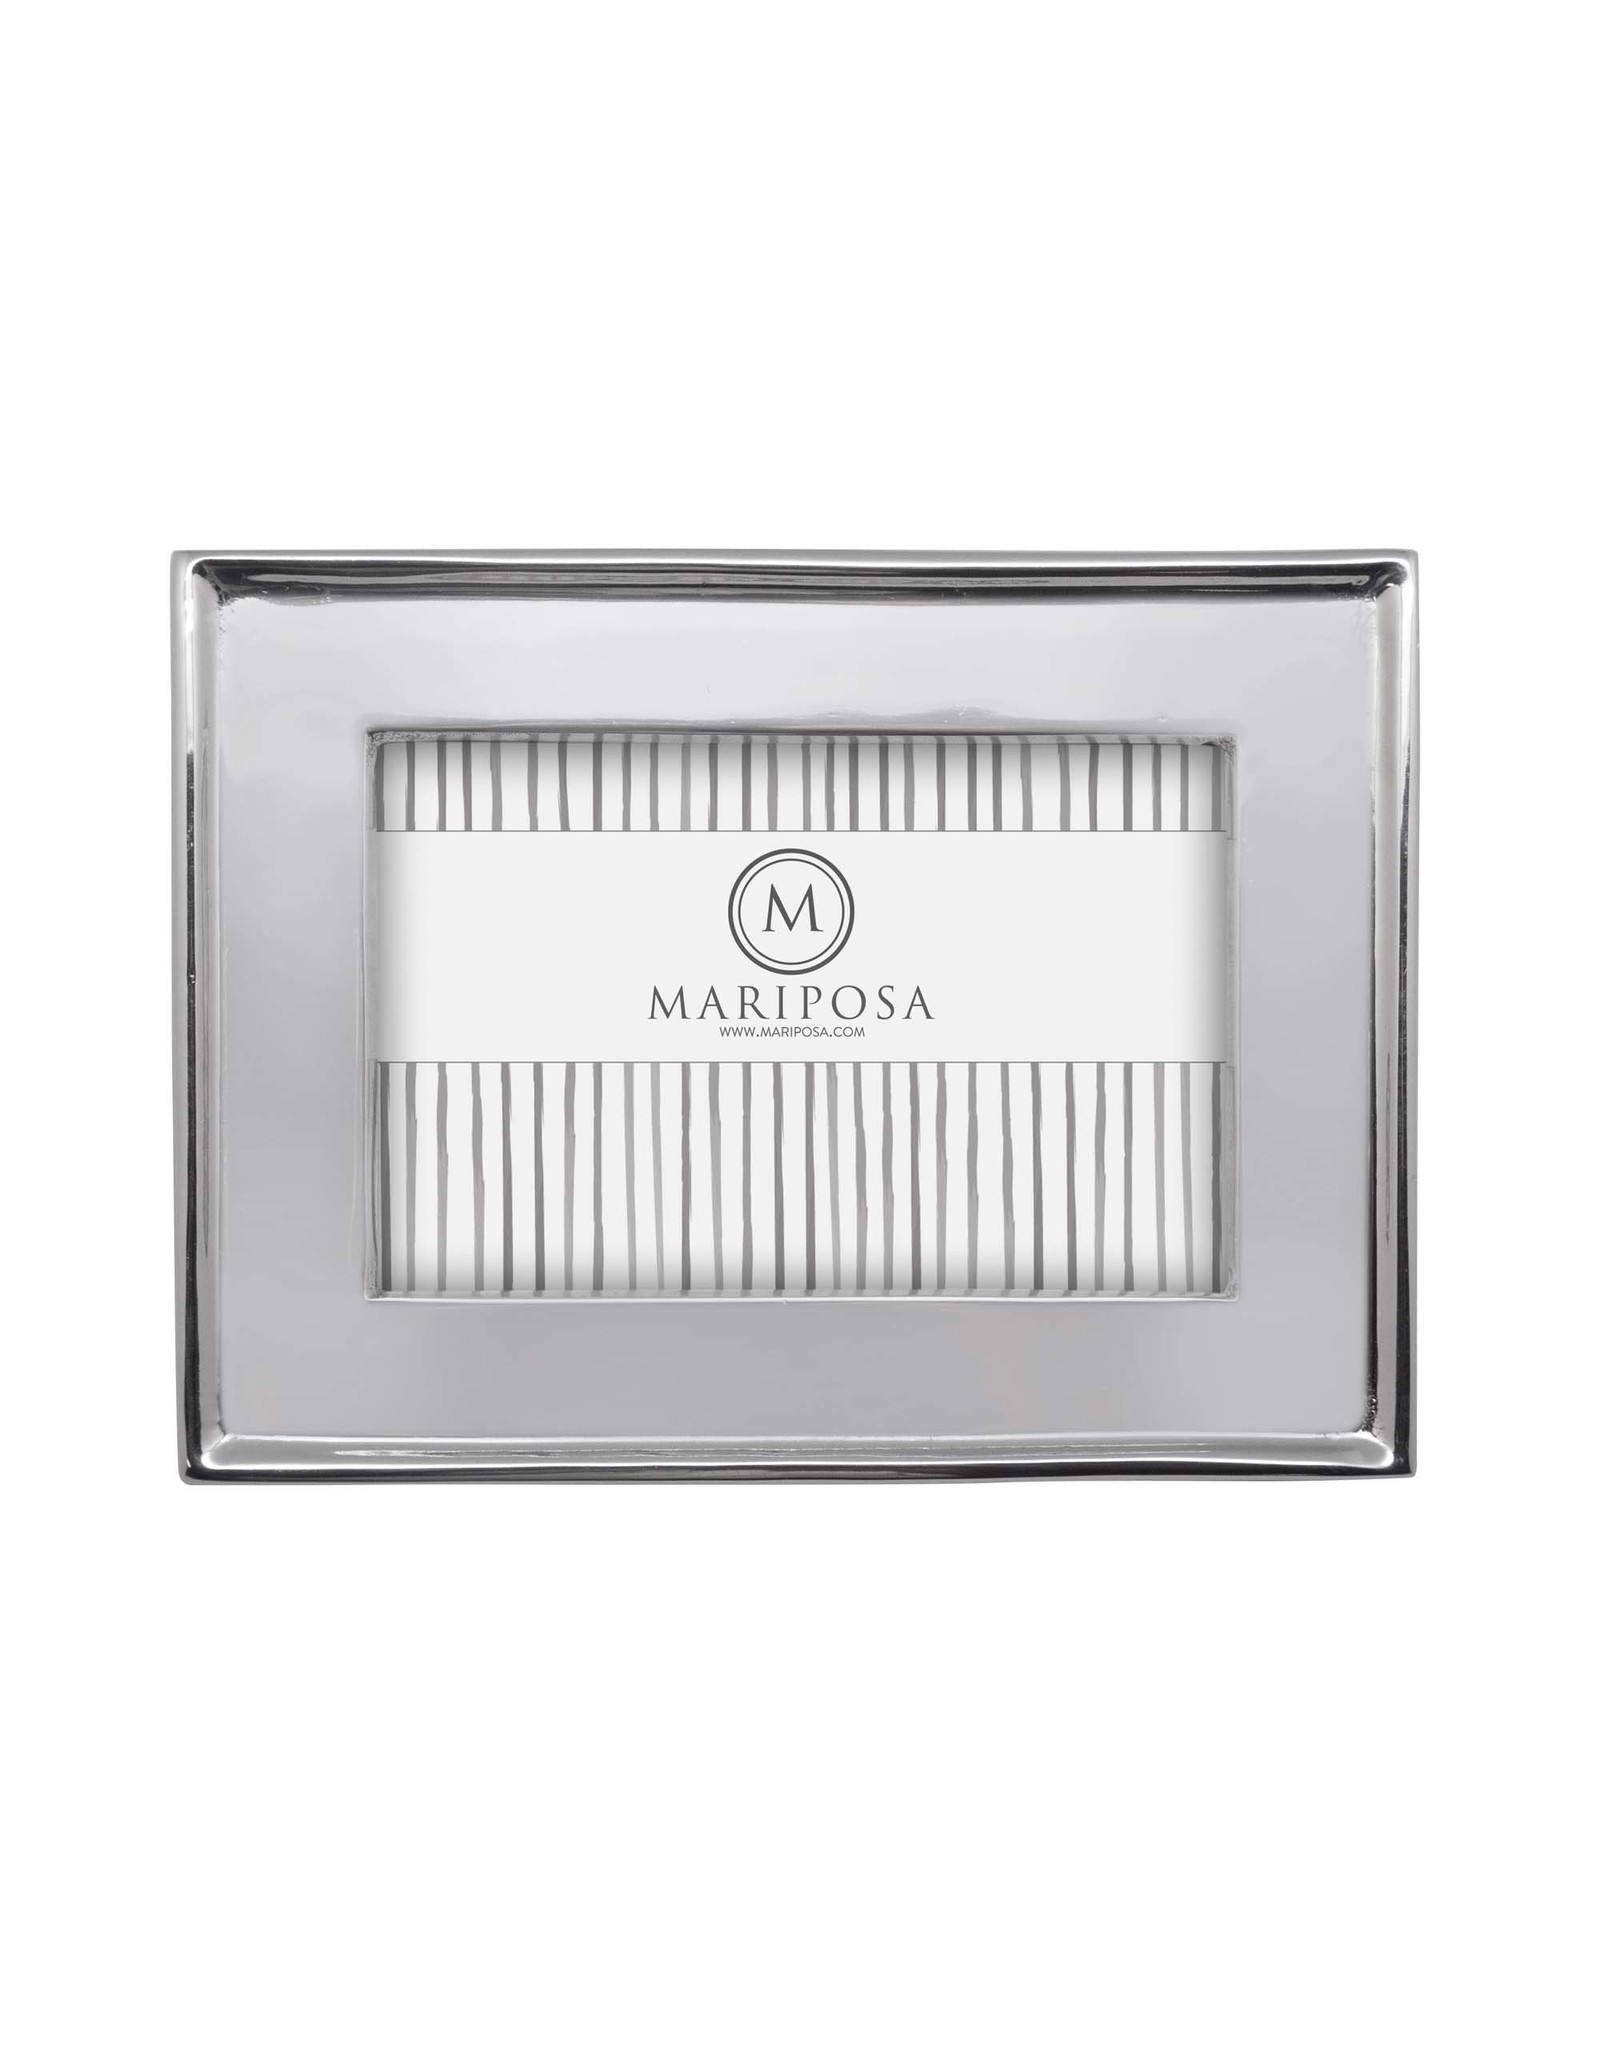 Mariposa Frame Signature Engravable 4x6